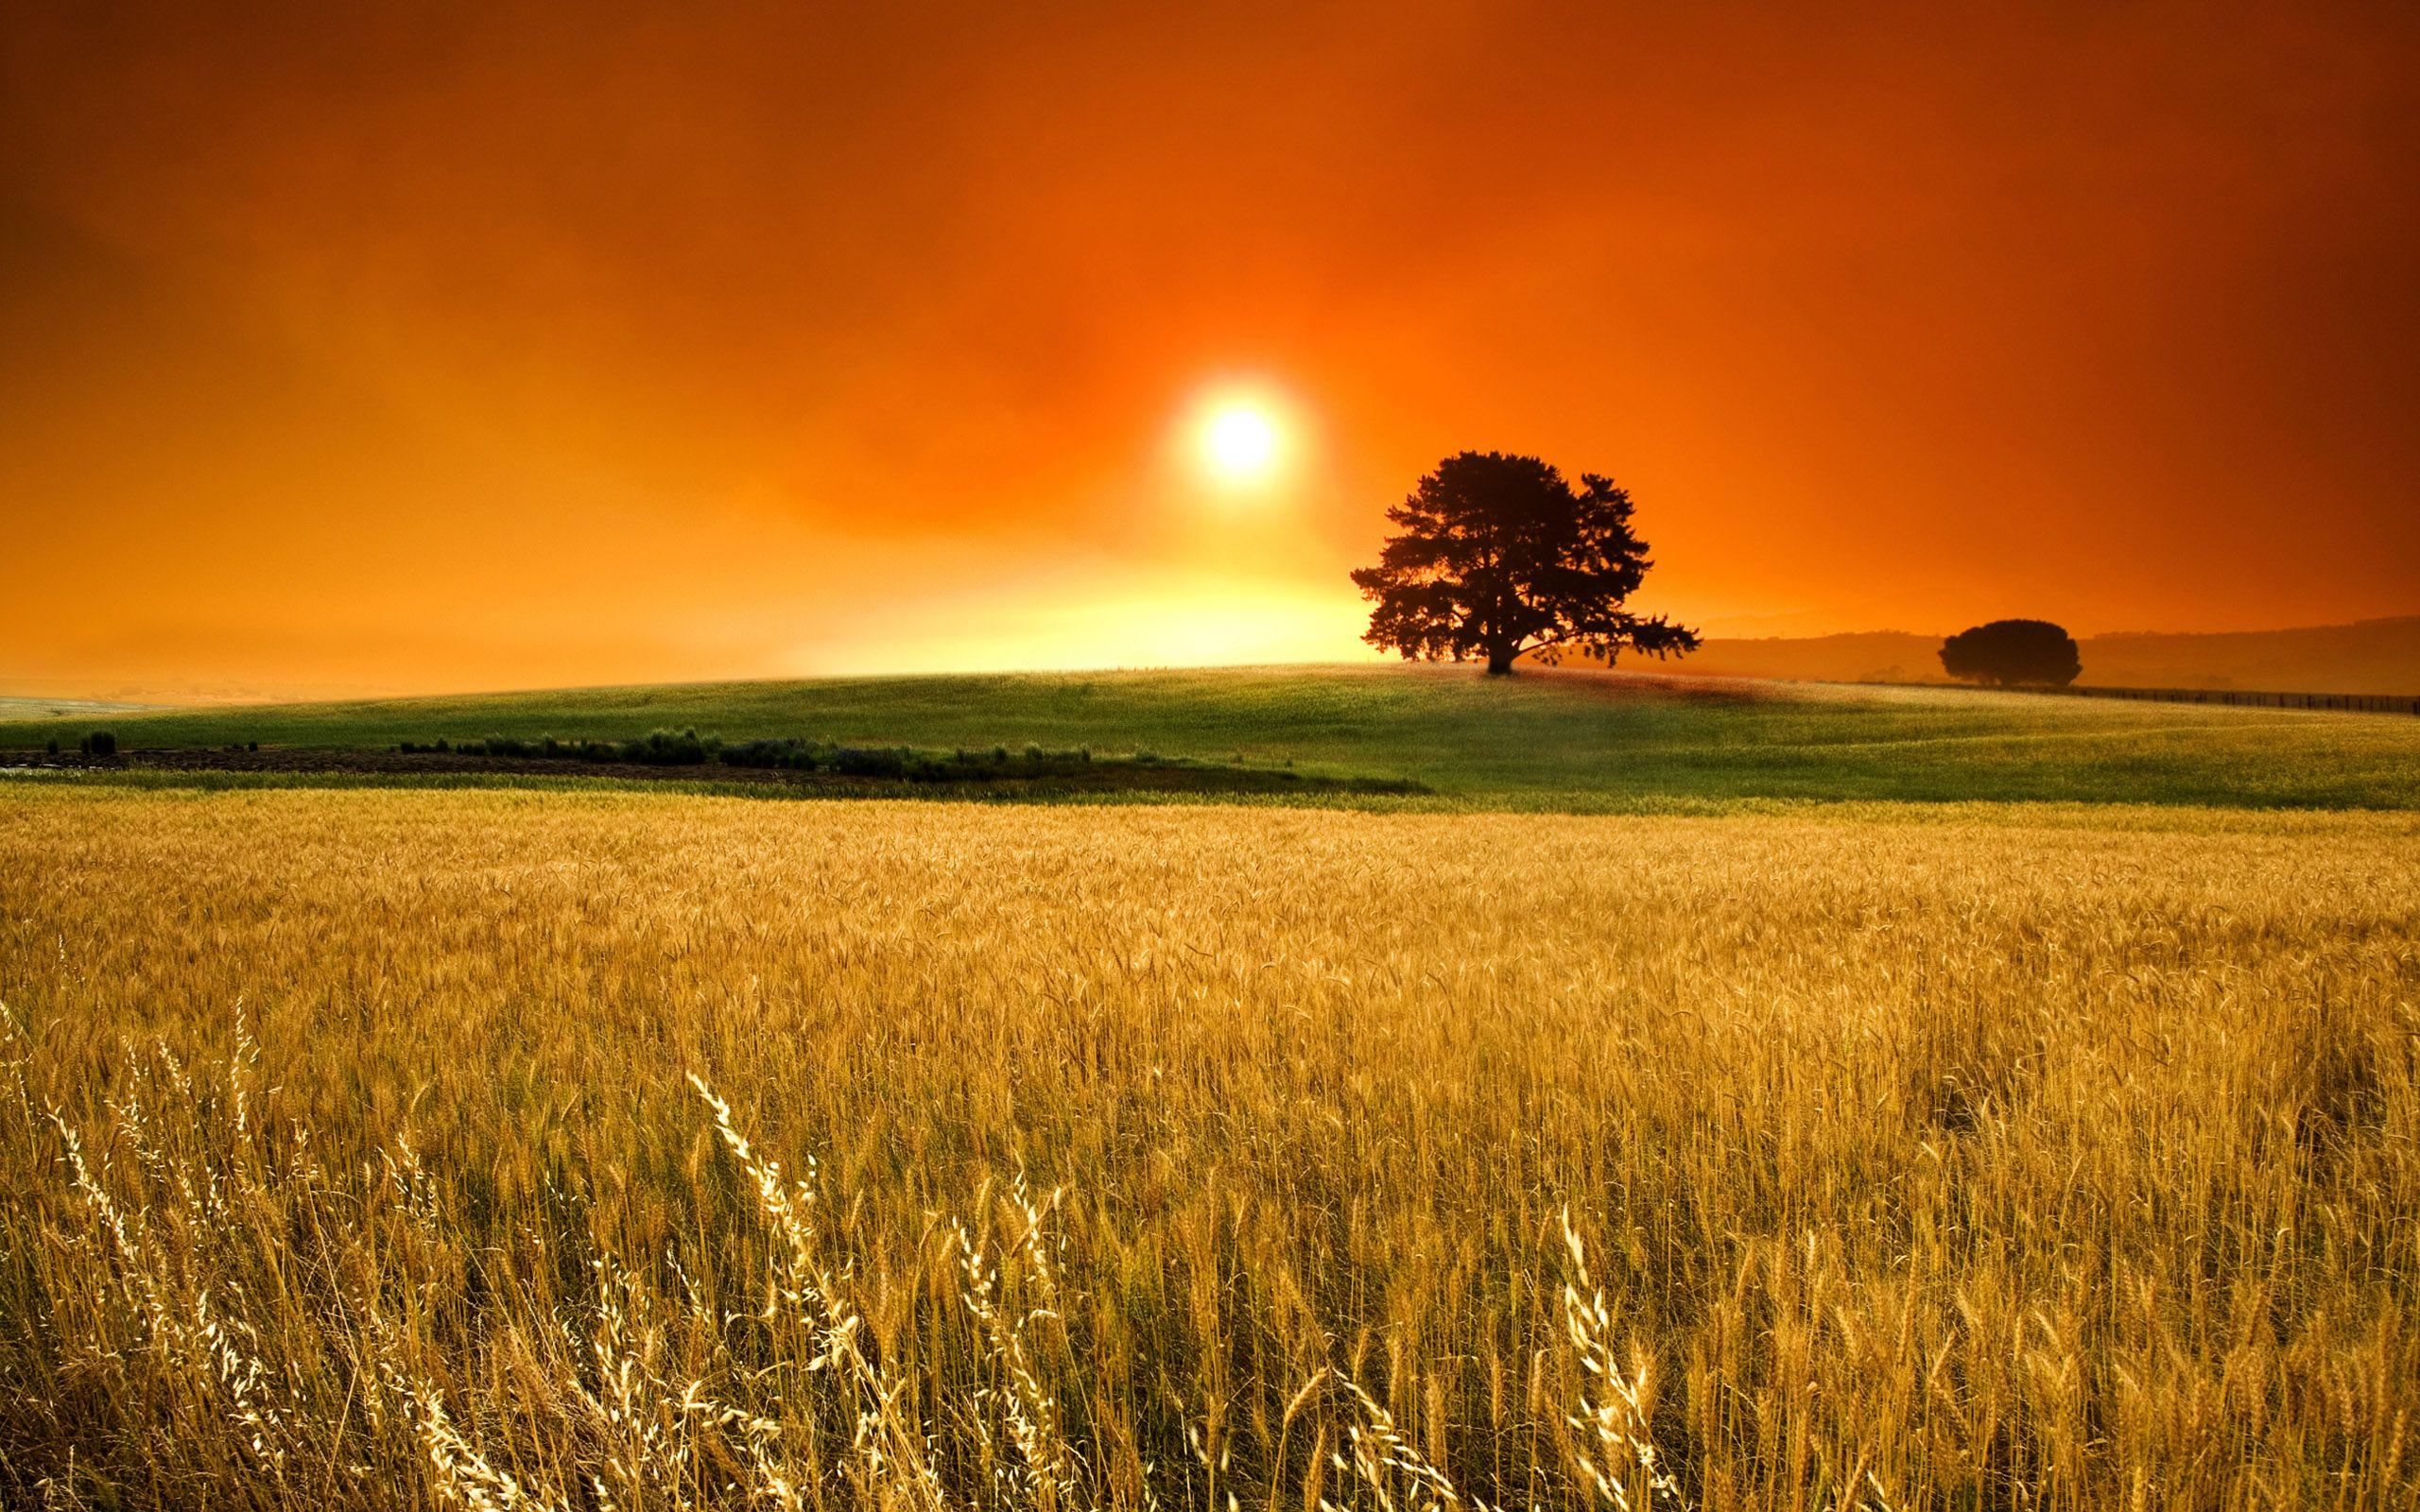 Hd beautiful natural scenery free stock photos download